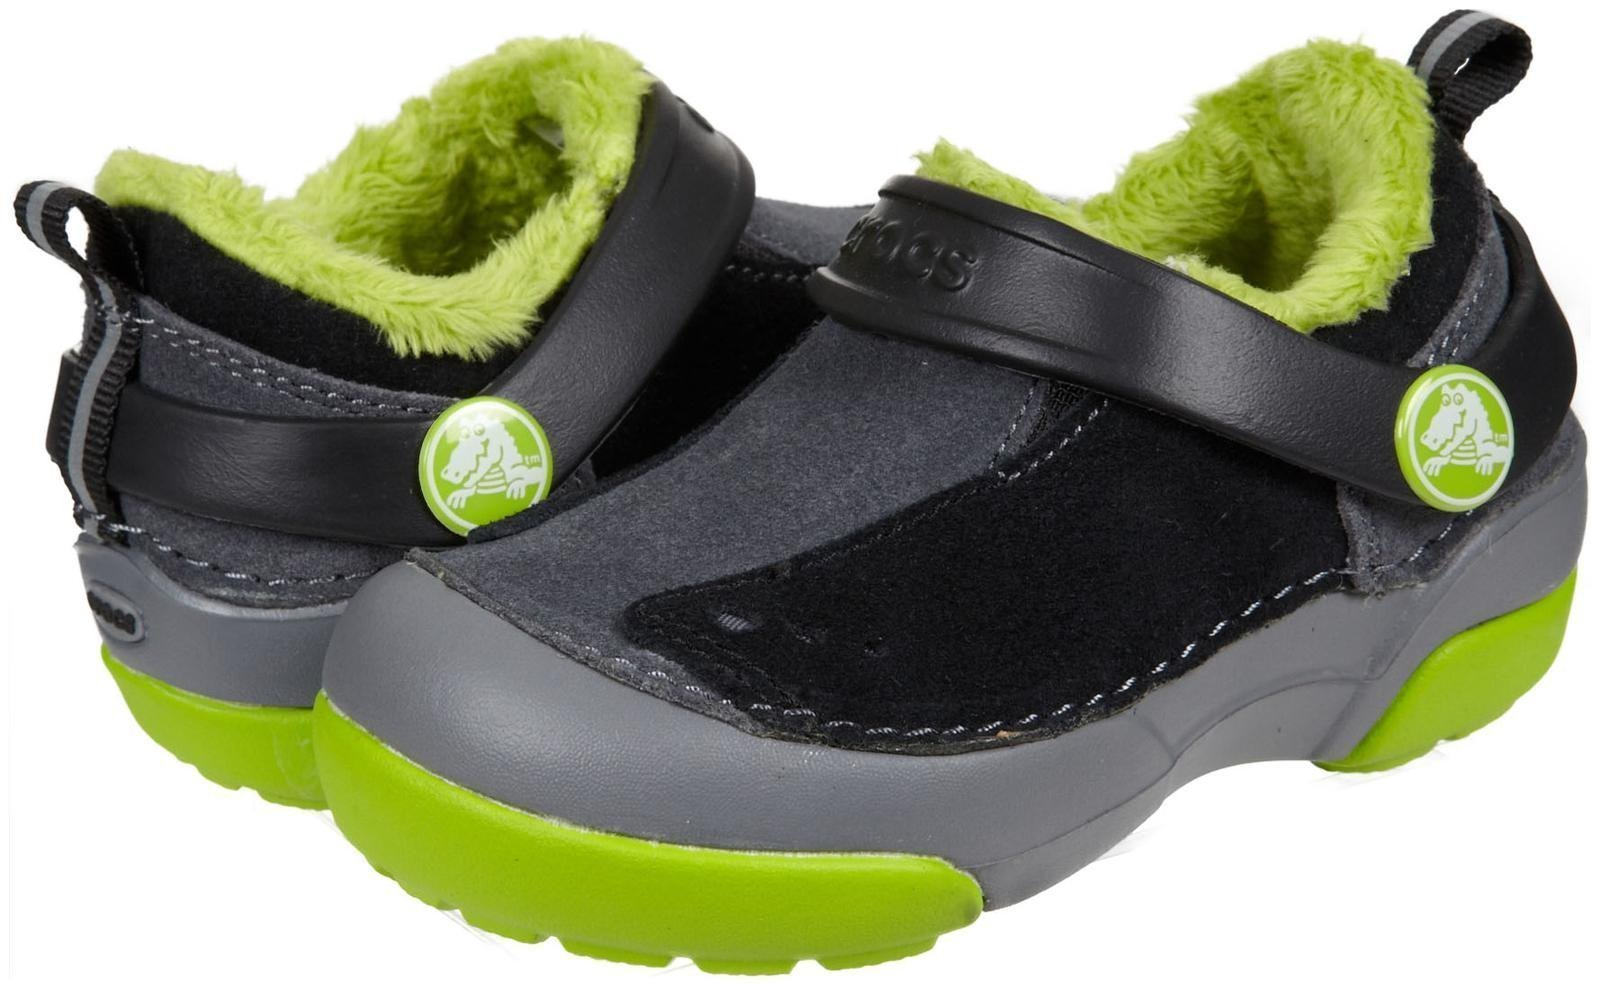 Crocs Kids Boy's Dawson Slip-on Lined Sneaker PS (Toddler/Little Kid) Charcoal/Black 9 Toddler M by Crocs